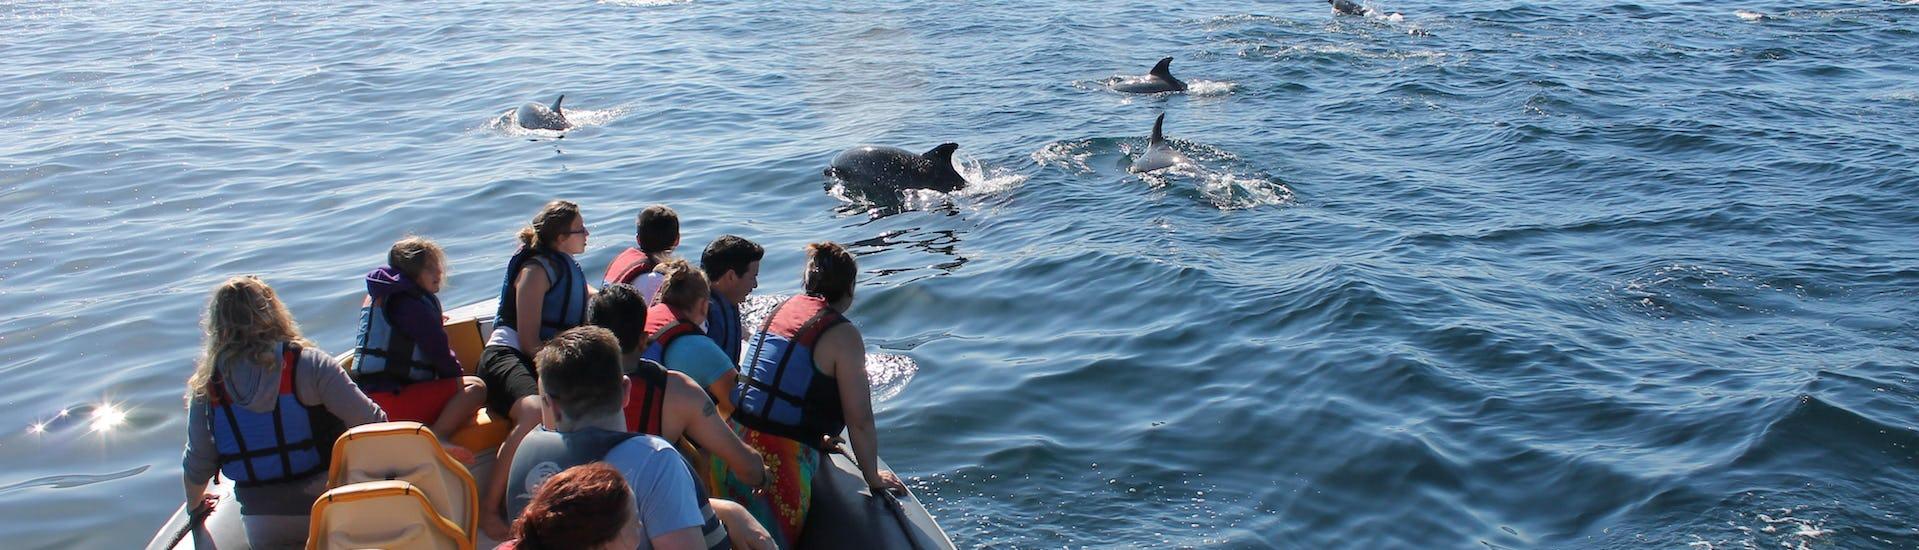 "Boat Tour ""Dolphin Watching"" - Praia Da Luz"